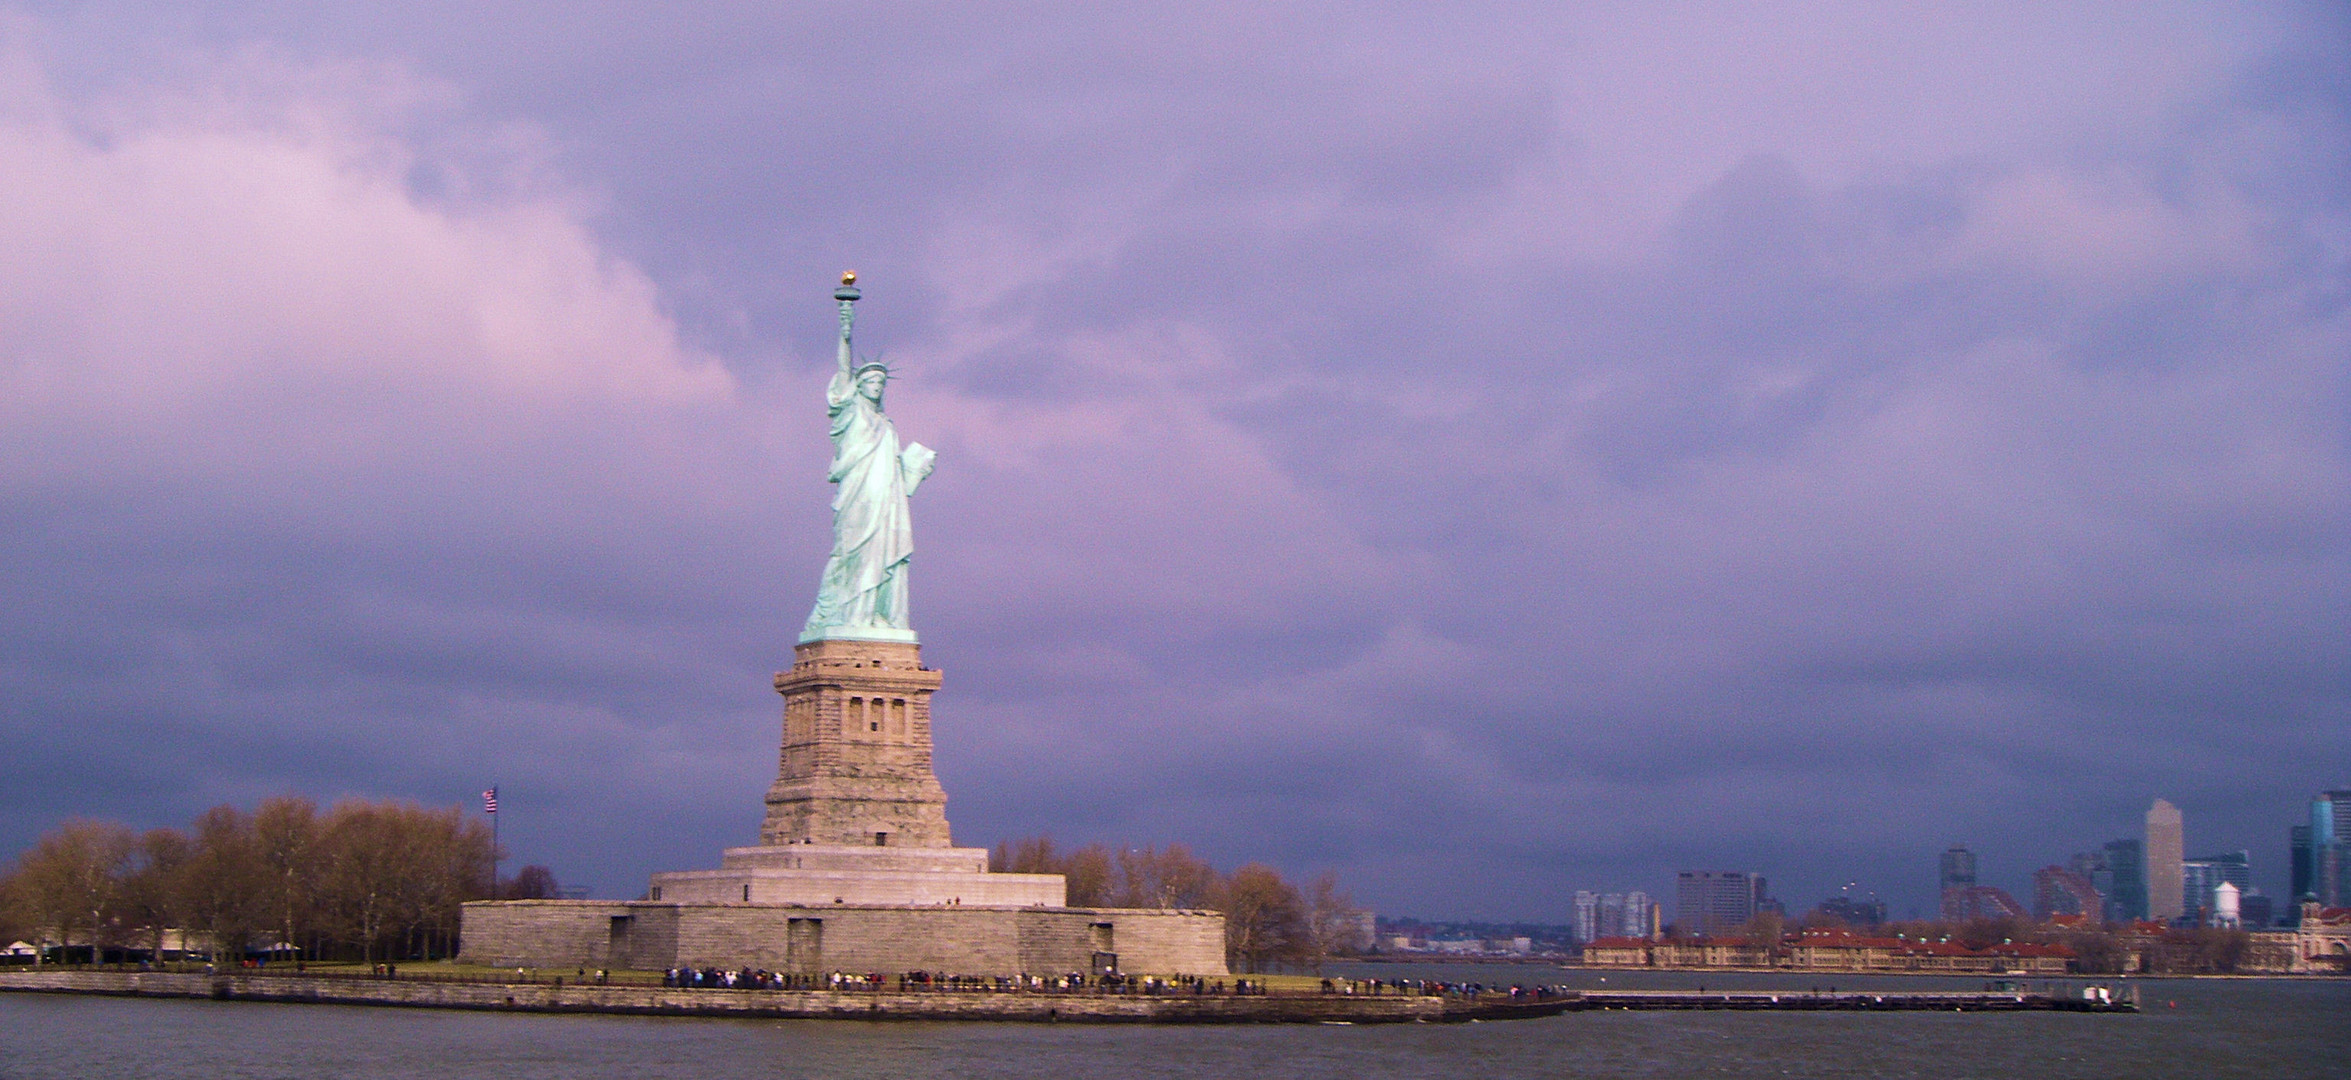 Statue de la liberte ; les couleurs de l'hiver